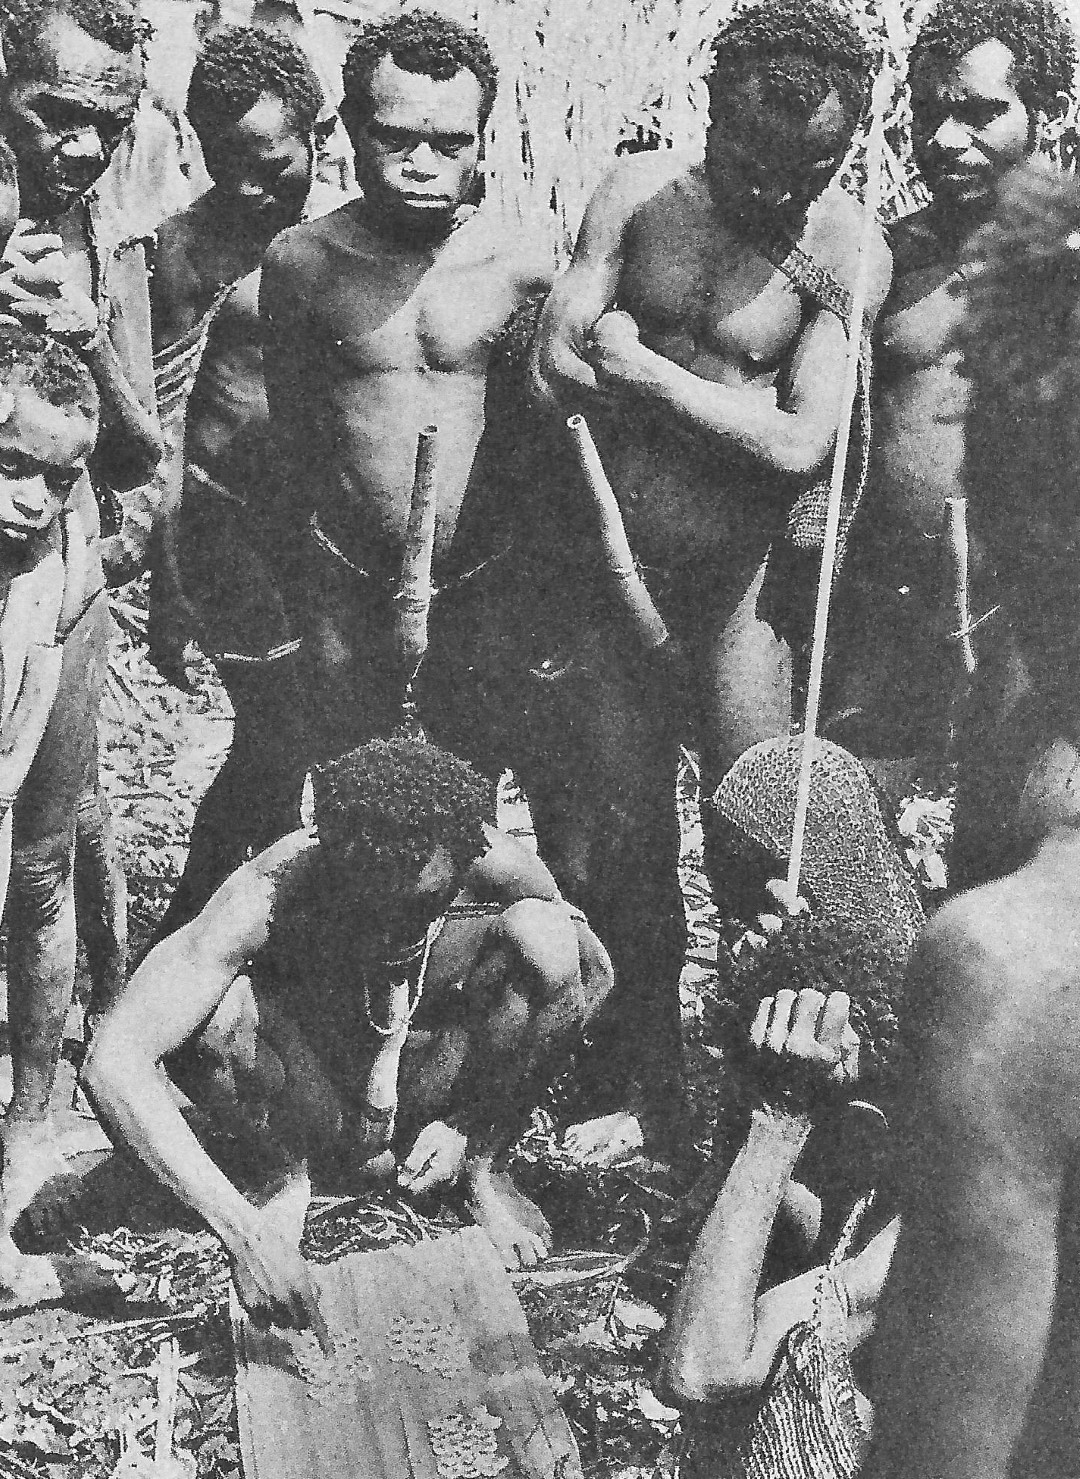 Abb. 1-1: Indonesien: Provinz Papua: Dorf Botukebo. Männer der Kapauku zahlen einen Brautpreis (aus Pospisil, 1962)